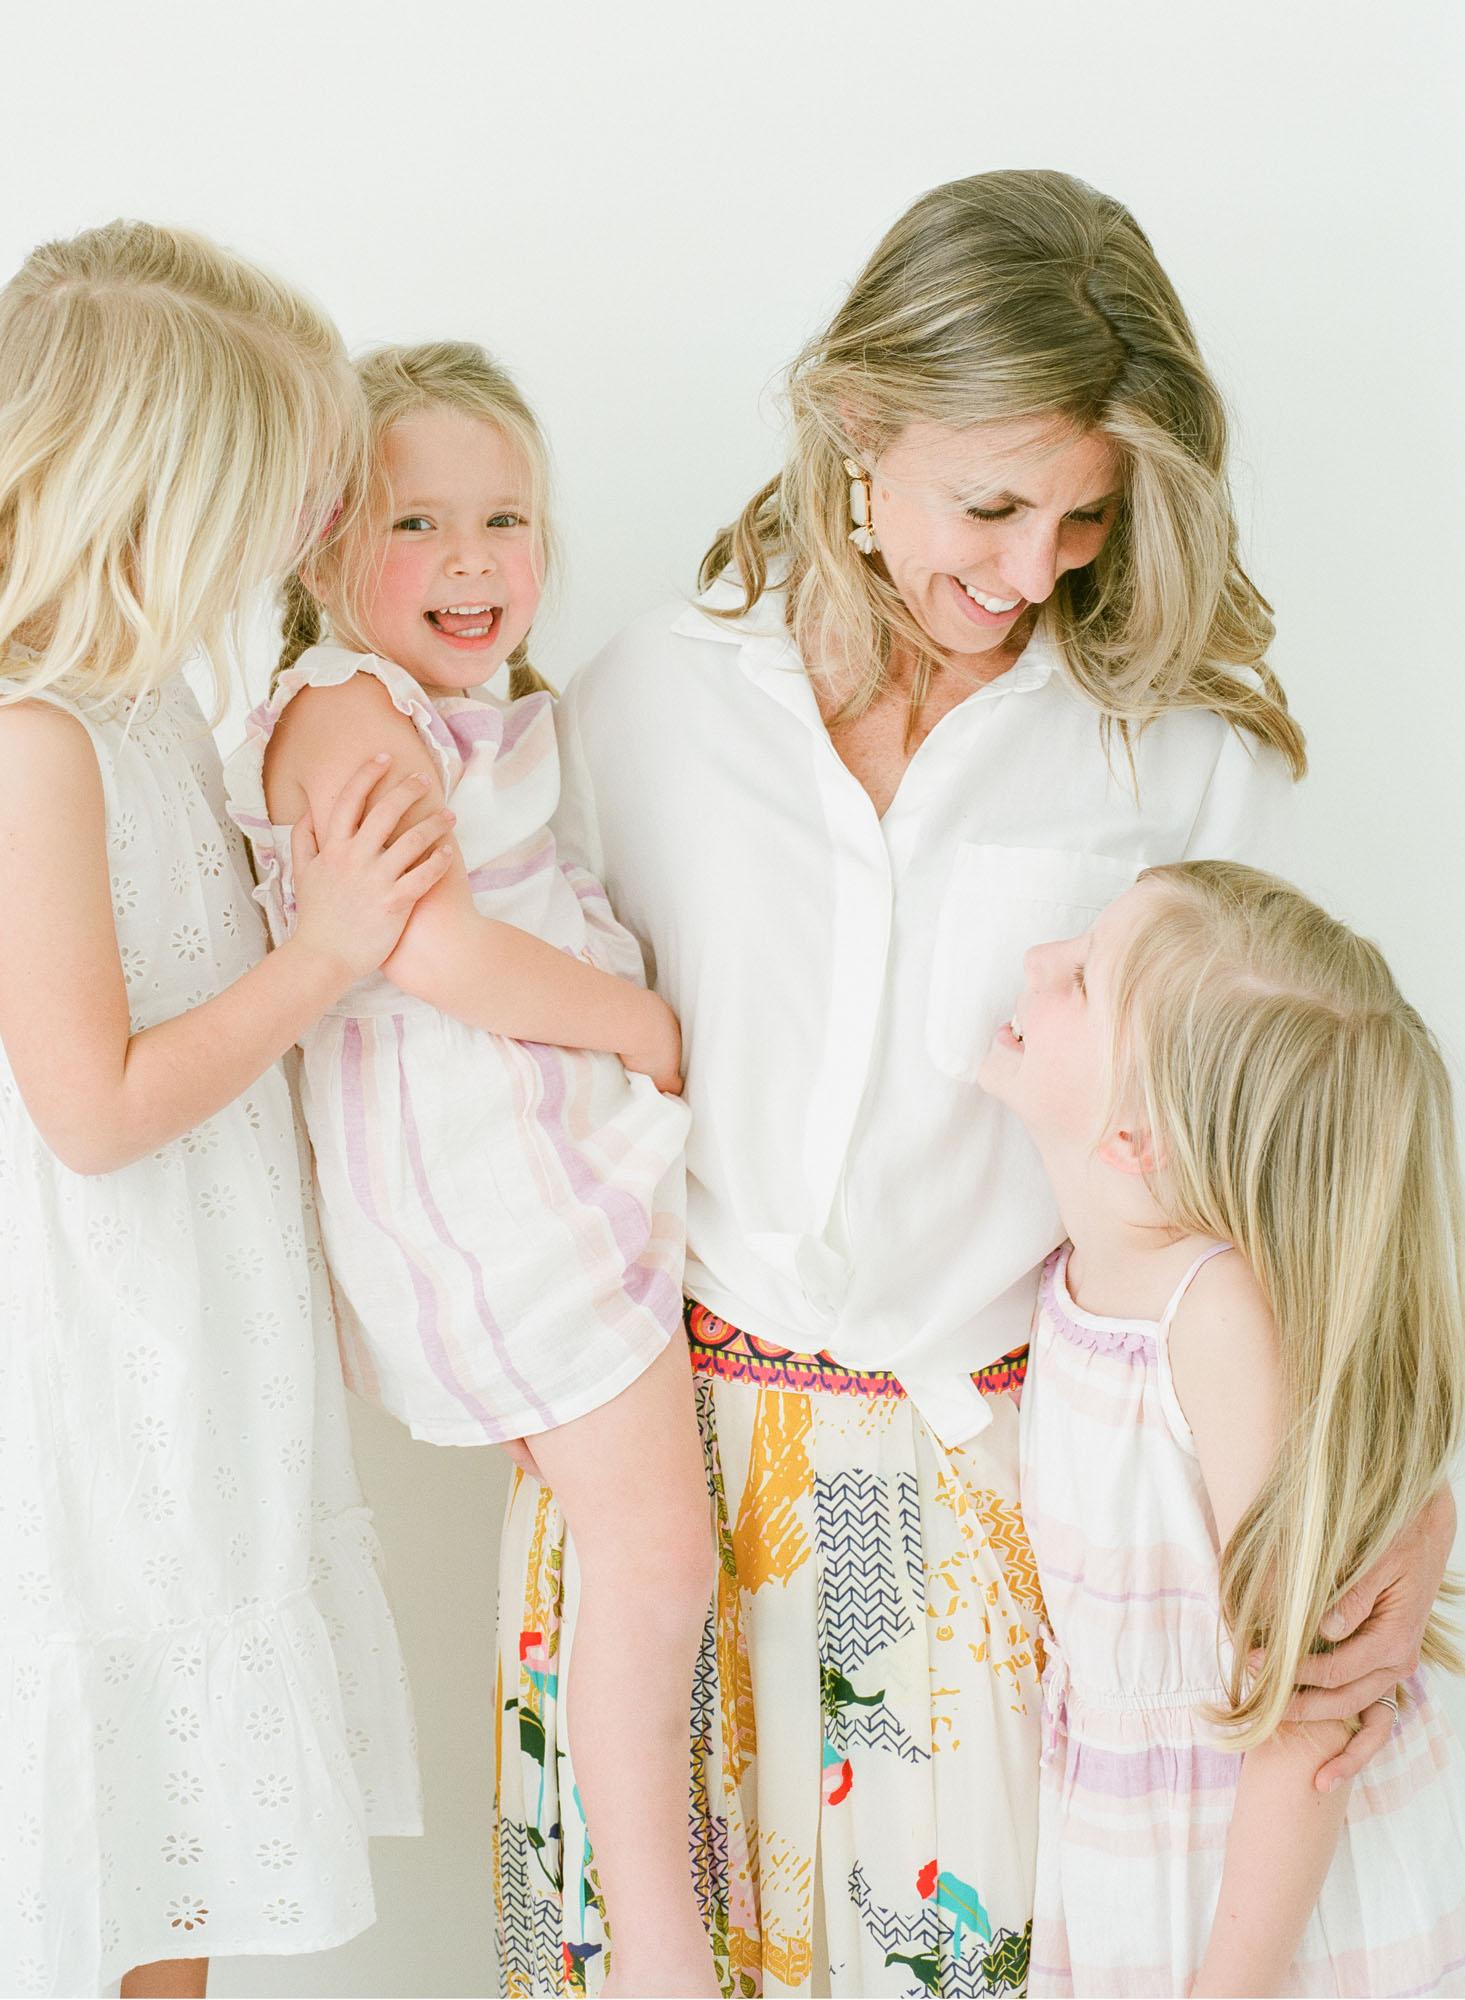 family-photographer-wake-forest-nc-motherhood-studio-portraits-002